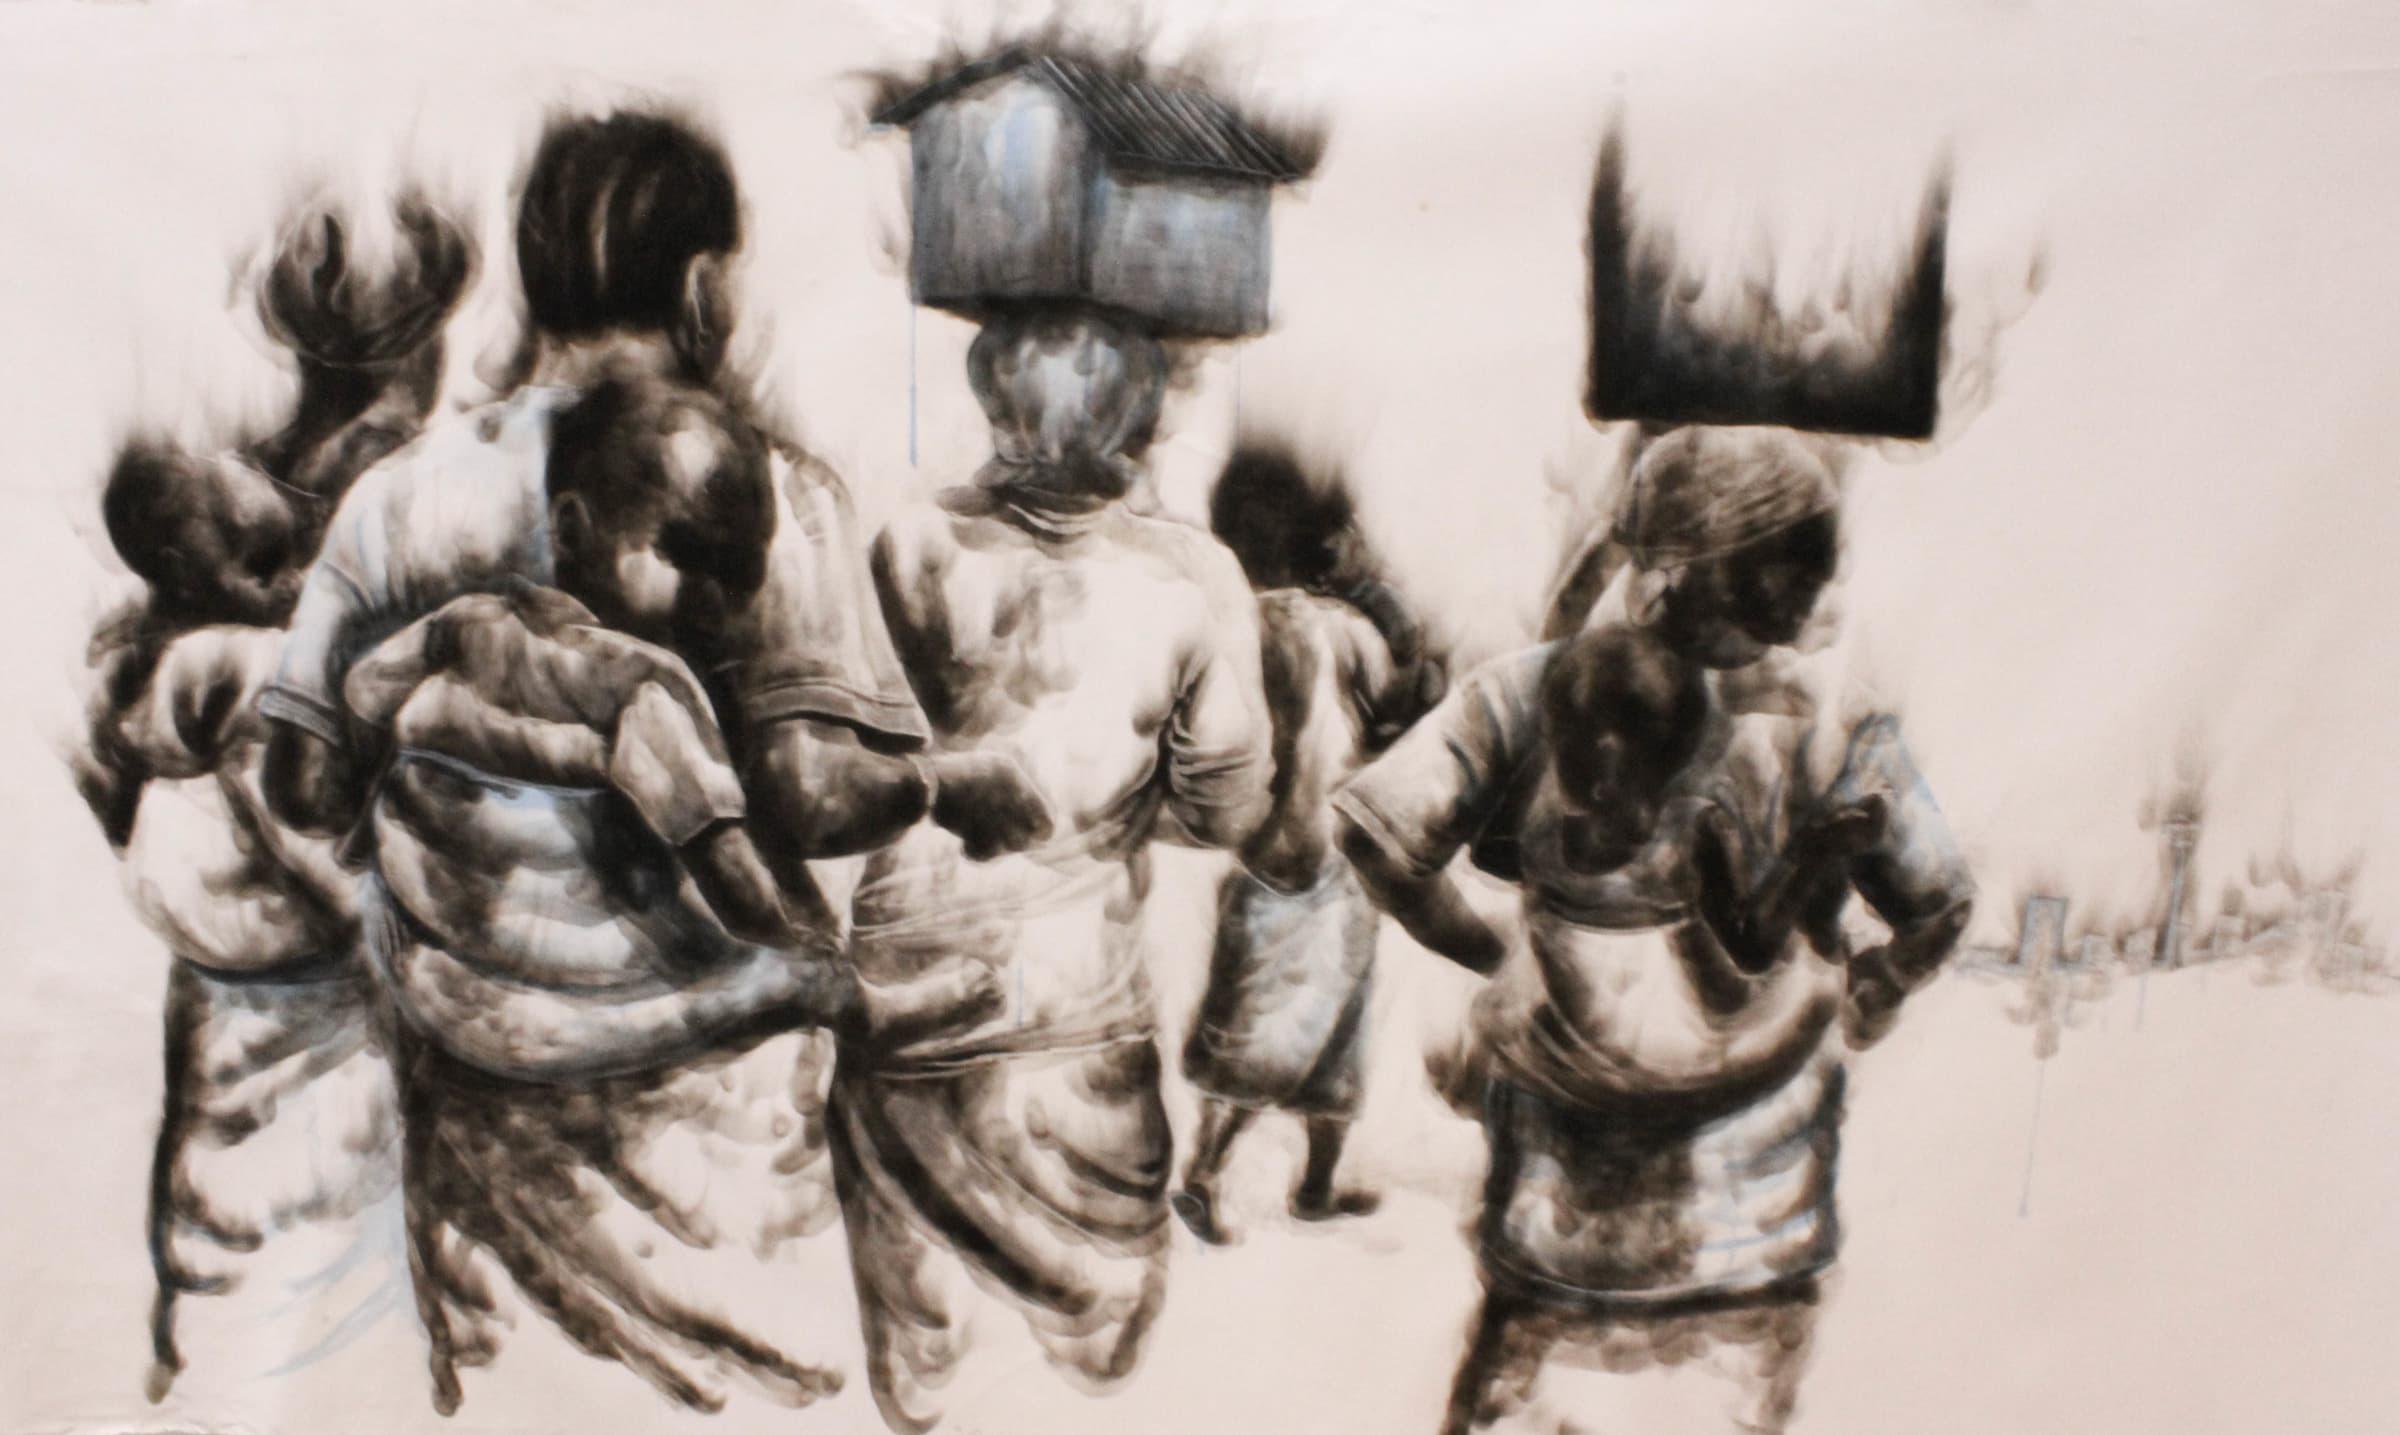 <span class=&#34;link fancybox-details-link&#34;><a href=&#34;/artworks/760-azael-langa-on-the-backs-of-giants-2018/&#34;>View Detail Page</a></span><div class=&#34;artist&#34;><strong>Azael Langa</strong></div> <div class=&#34;title&#34;><em>On The Backs Of Giants</em>, 2018</div> <div class=&#34;medium&#34;>Smoke And Ink On Canvas</div> <div class=&#34;dimensions&#34;>157.5cm x 266cm (180.5cm x 293.5cm framed)</div>